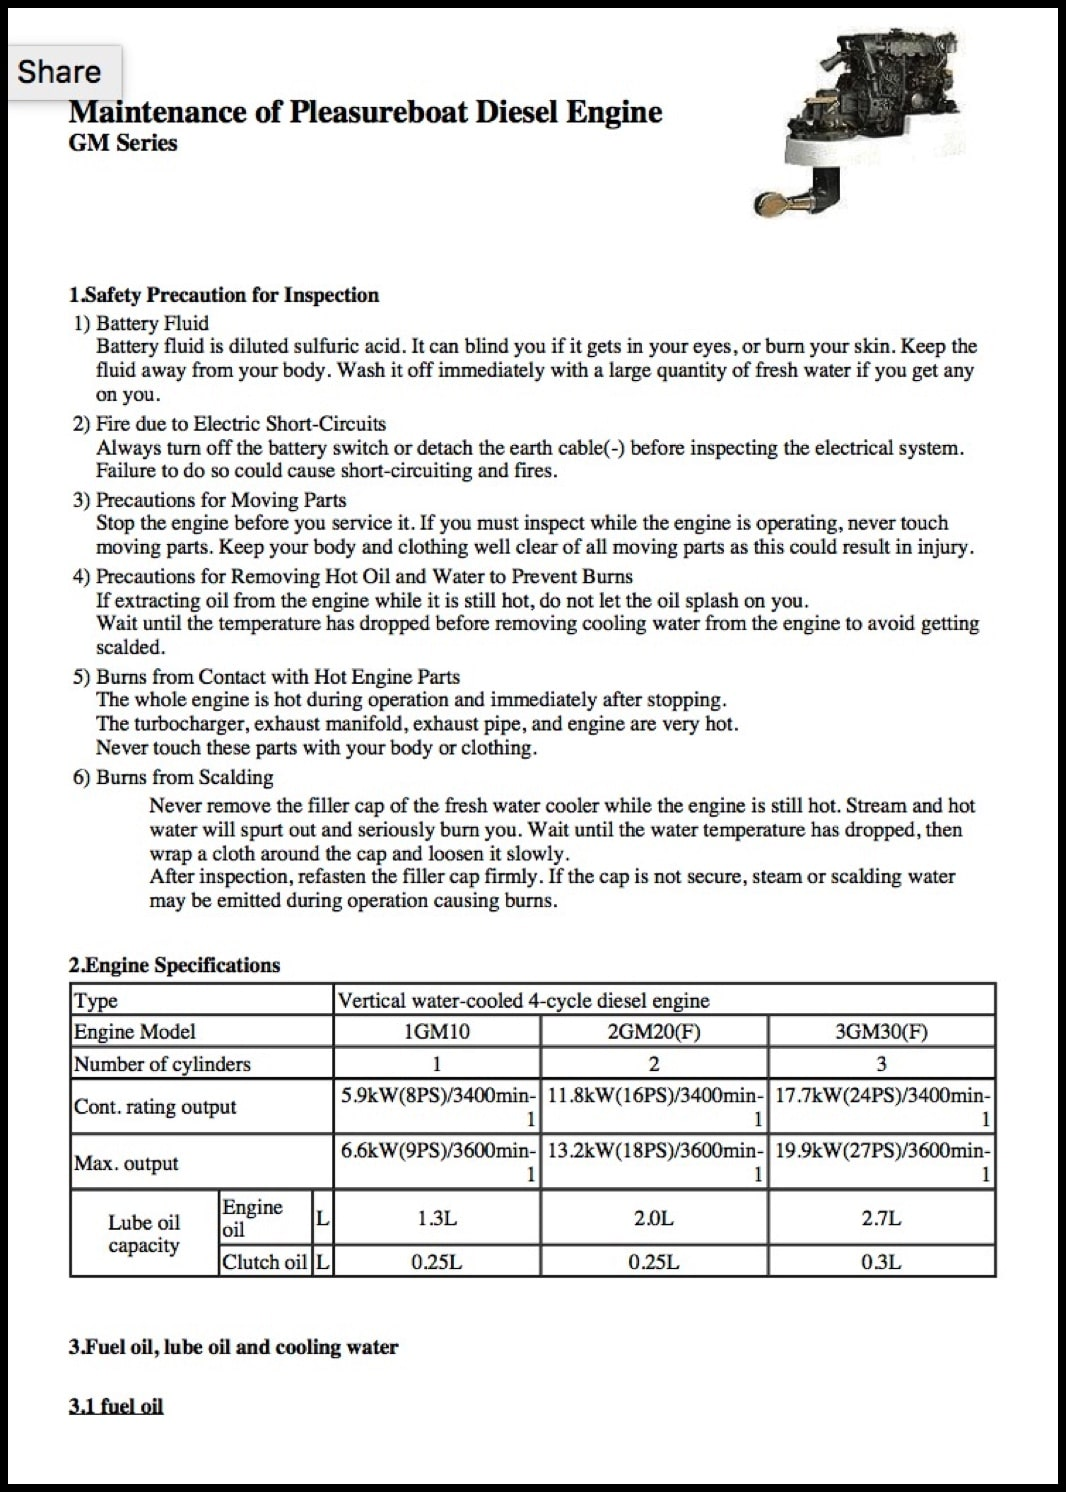 Diesel engine maintenance checklist user manuals array yanmar archives page 2 of 3 marine diesel basics rh marinedieselbasics com yanmar diesel engine maintenance guide gm series fandeluxe Choice Image